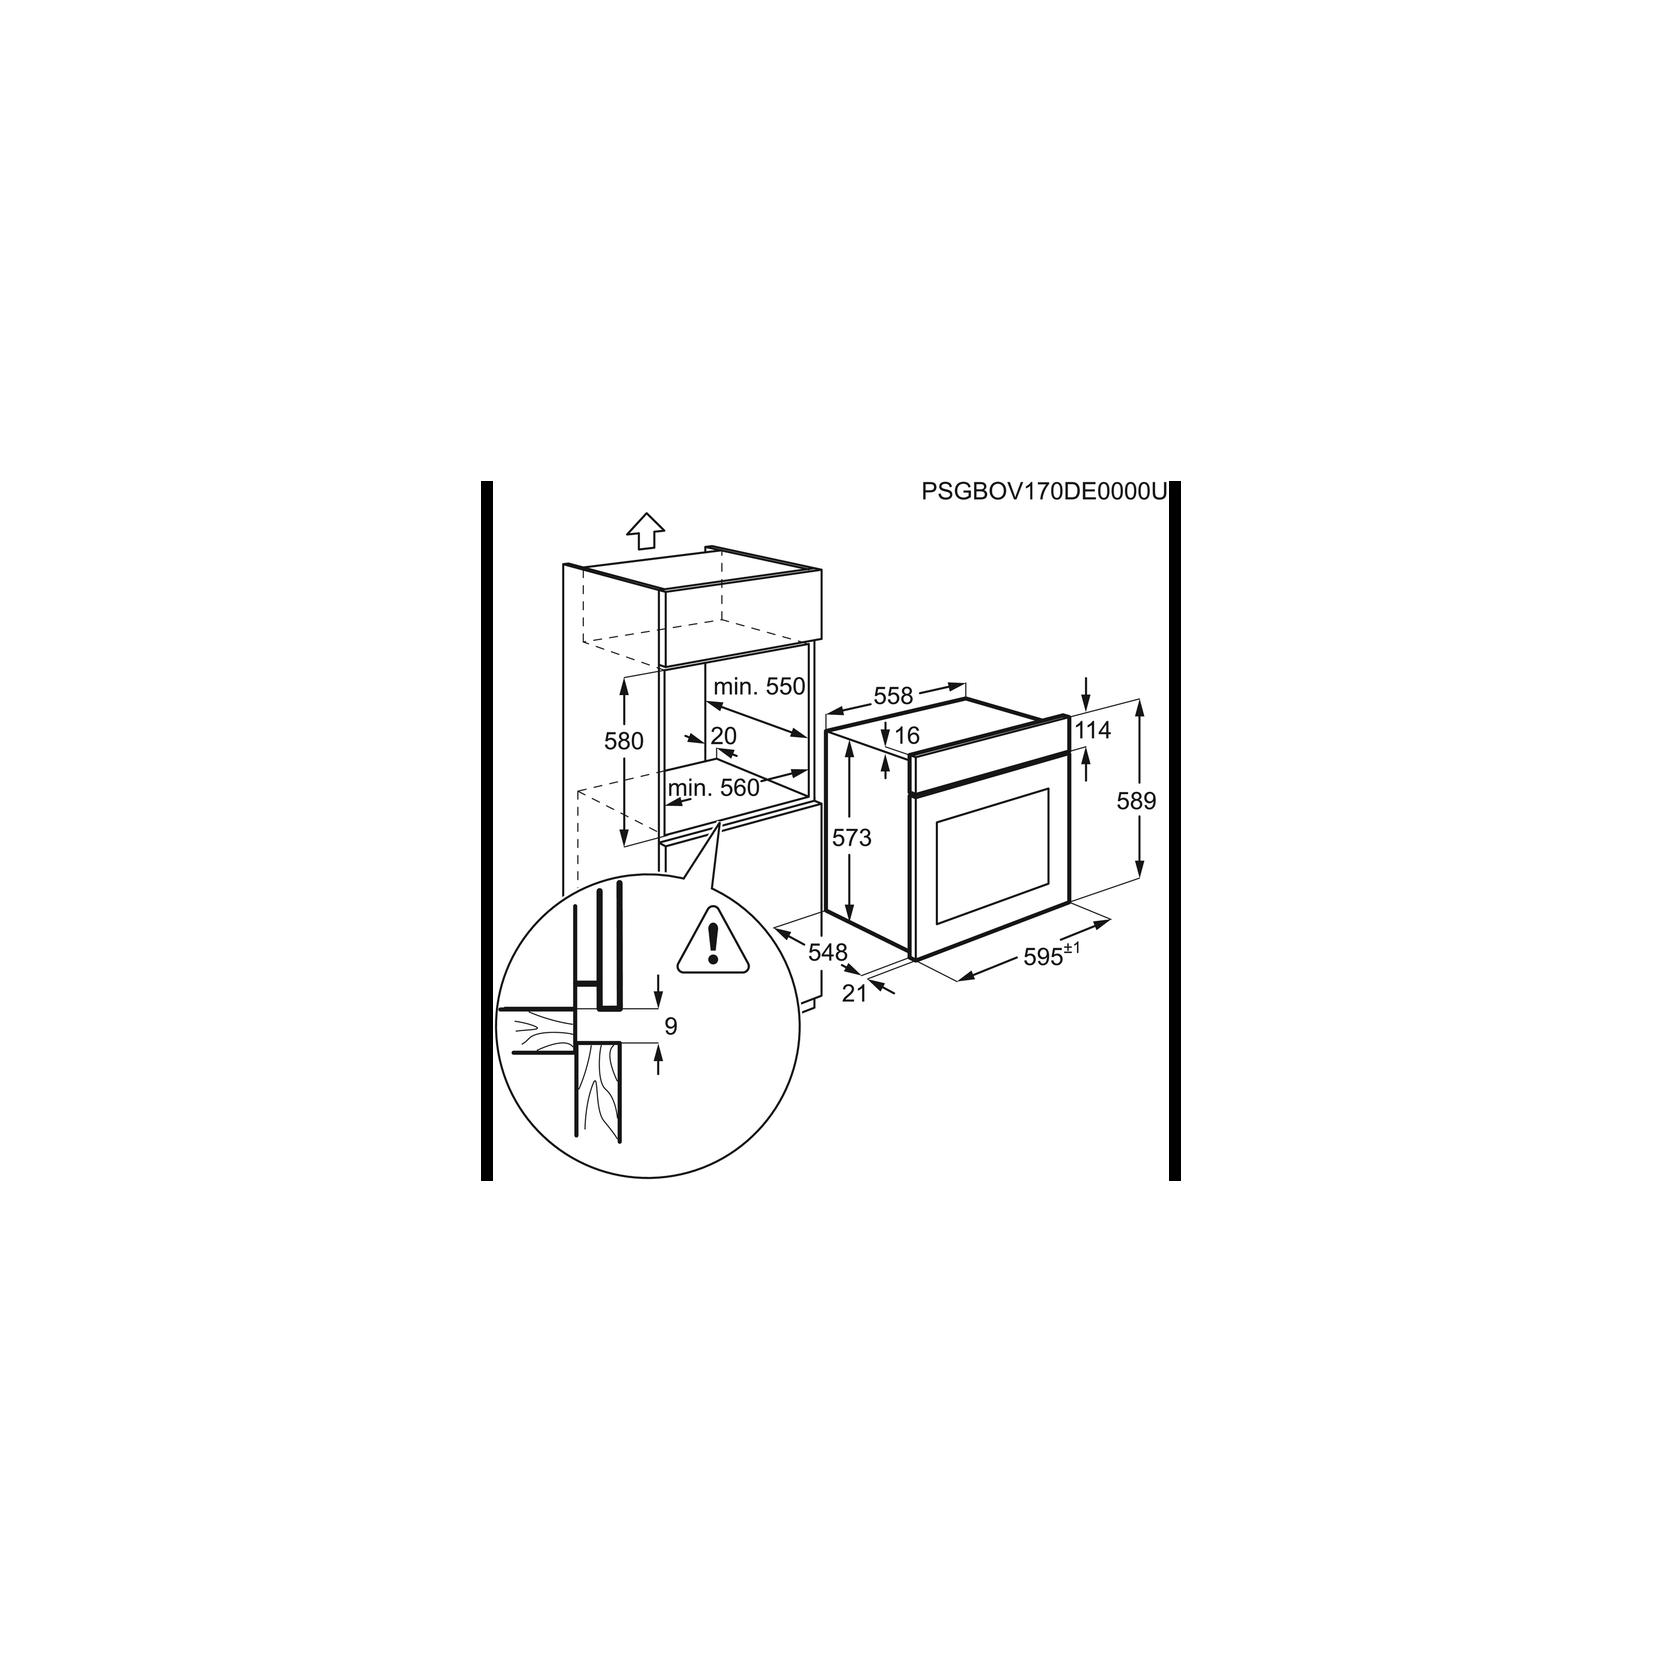 Forno incasso aeg bsk571221m classe a a vapore ventilato - Forno a vapore electrolux ...